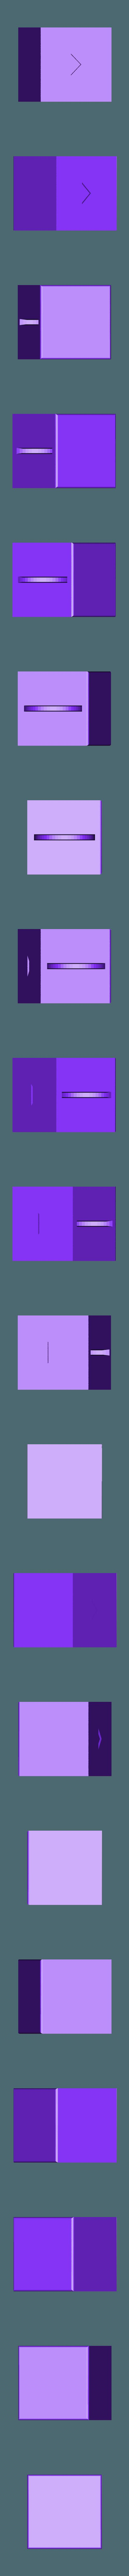 PennyPixelBlockArt2Faces.stl Download free STL file 3D Penny-Powered Pixel Art Blocks - Video Game Art • Model to 3D print, tonyyoungblood